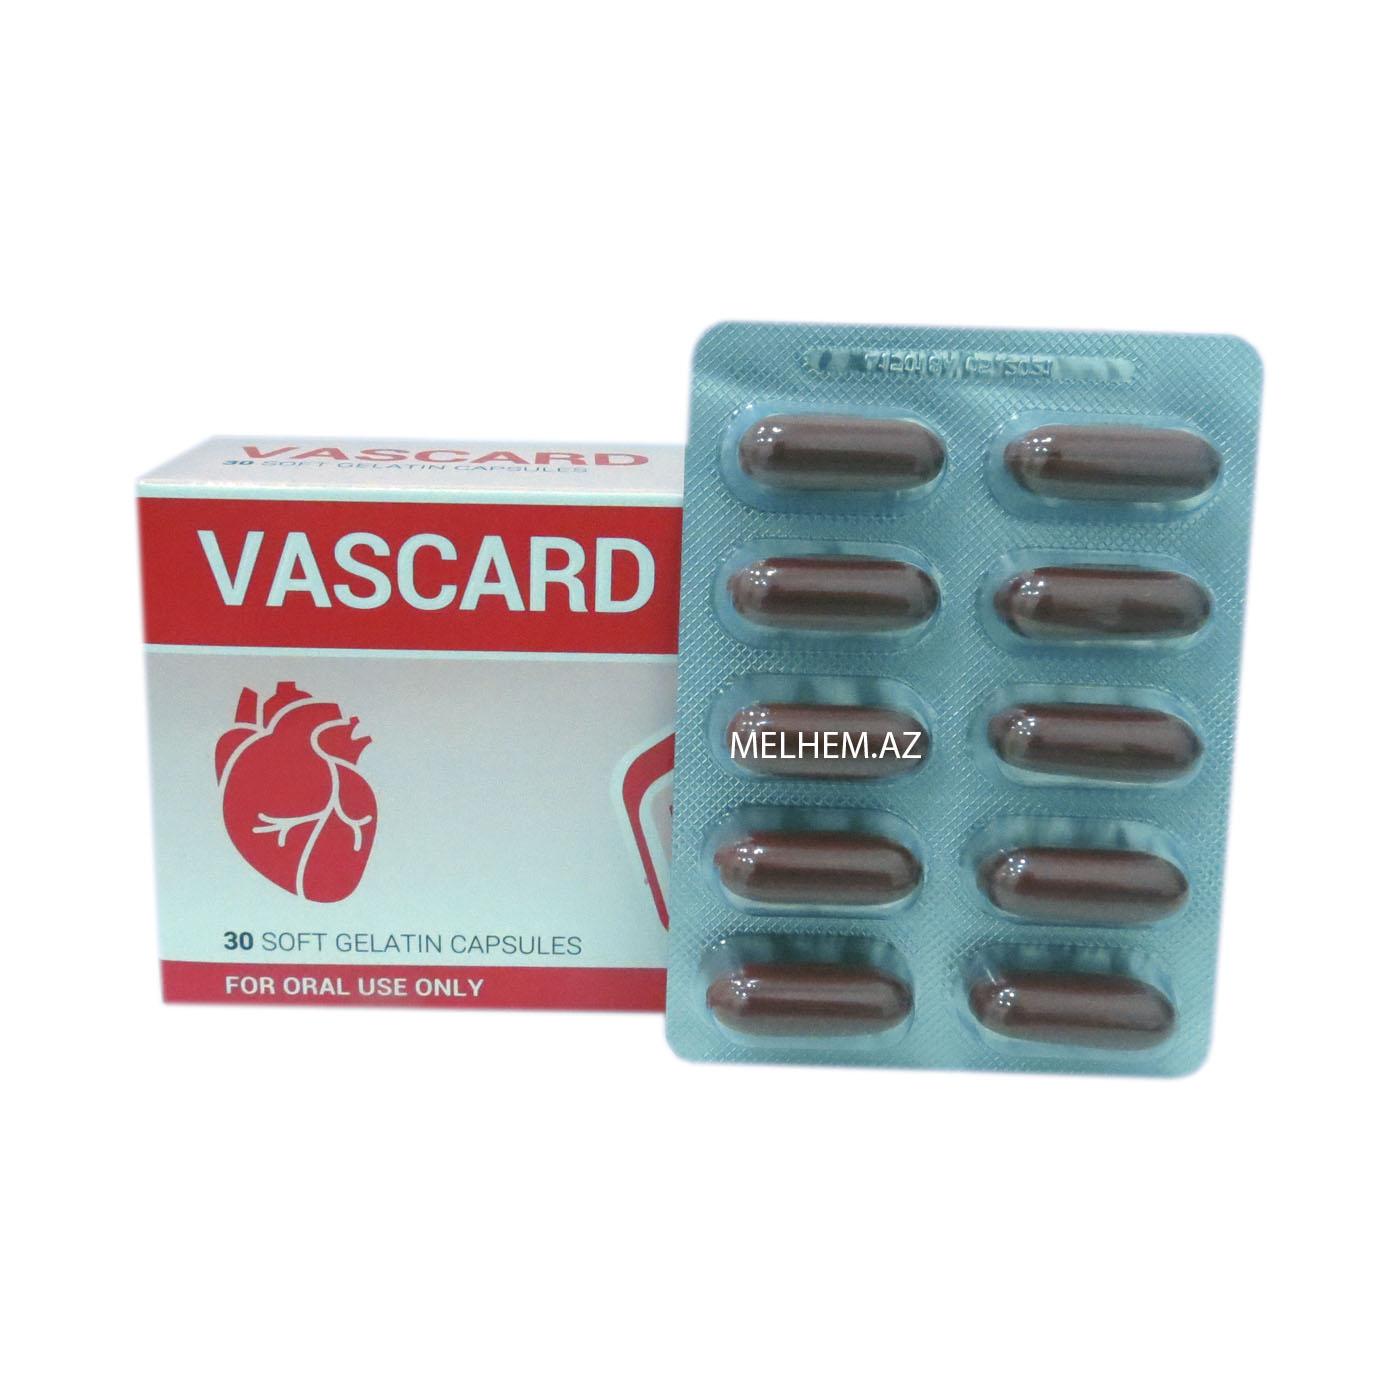 VASCARD